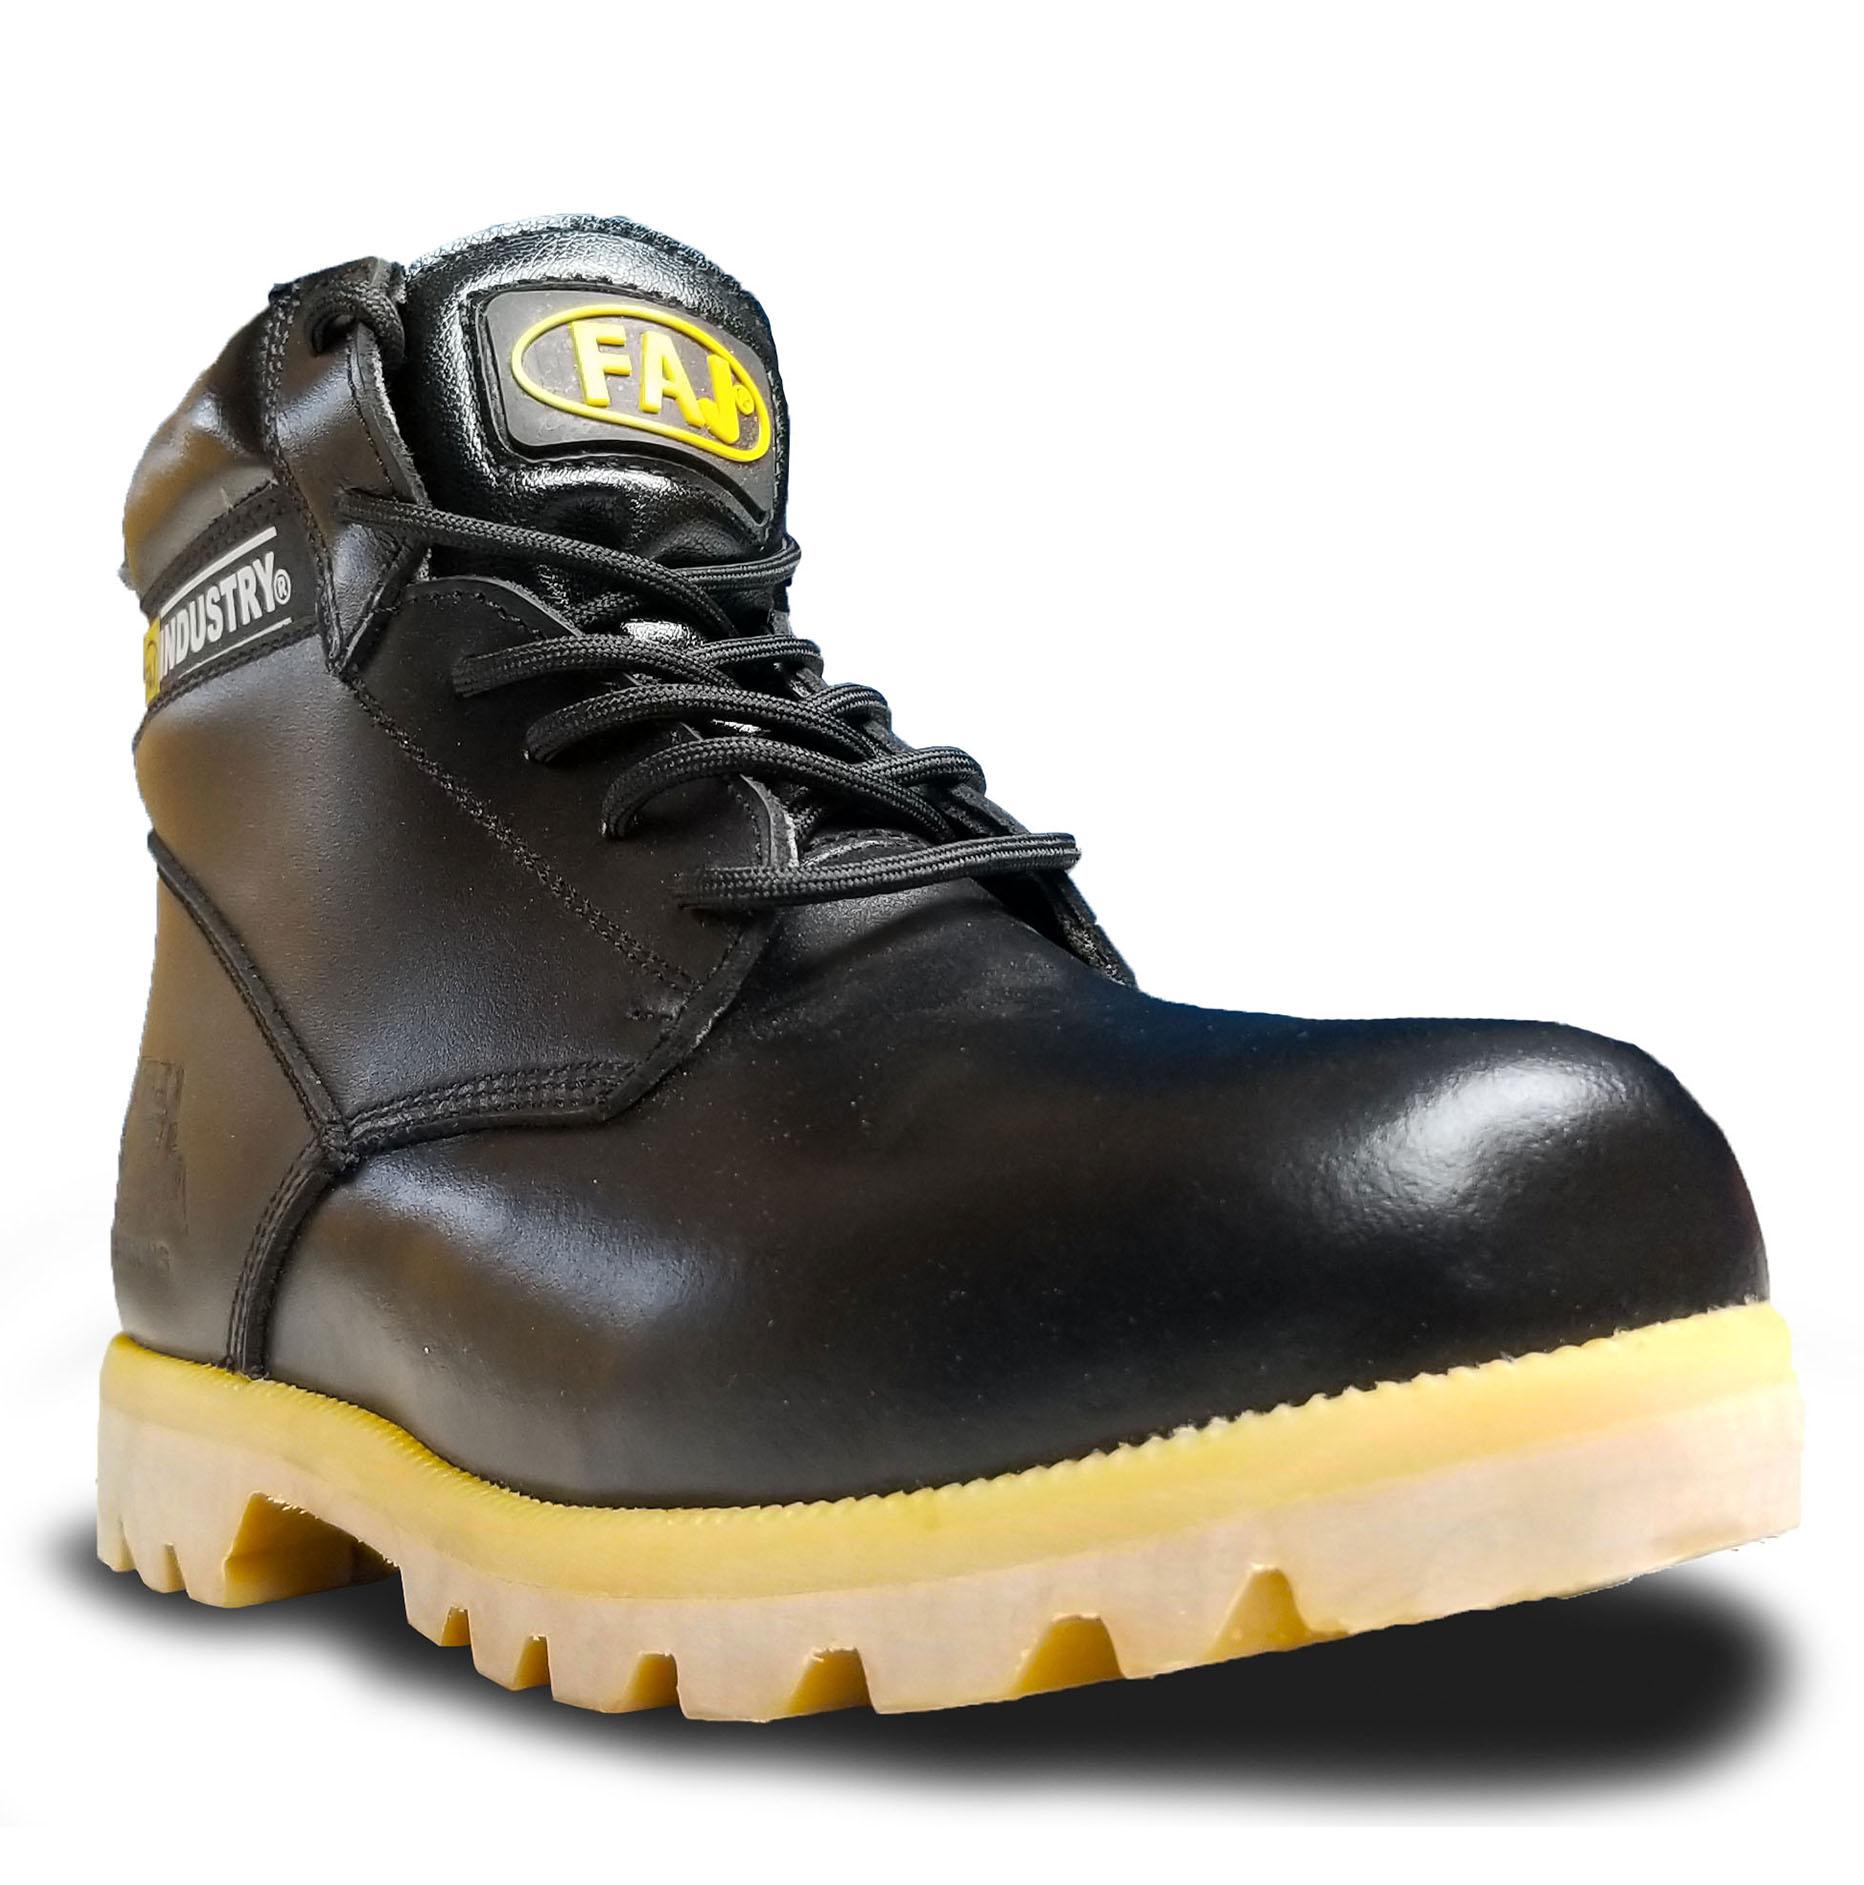 Zapato Strong dielectrico Negro 14KV